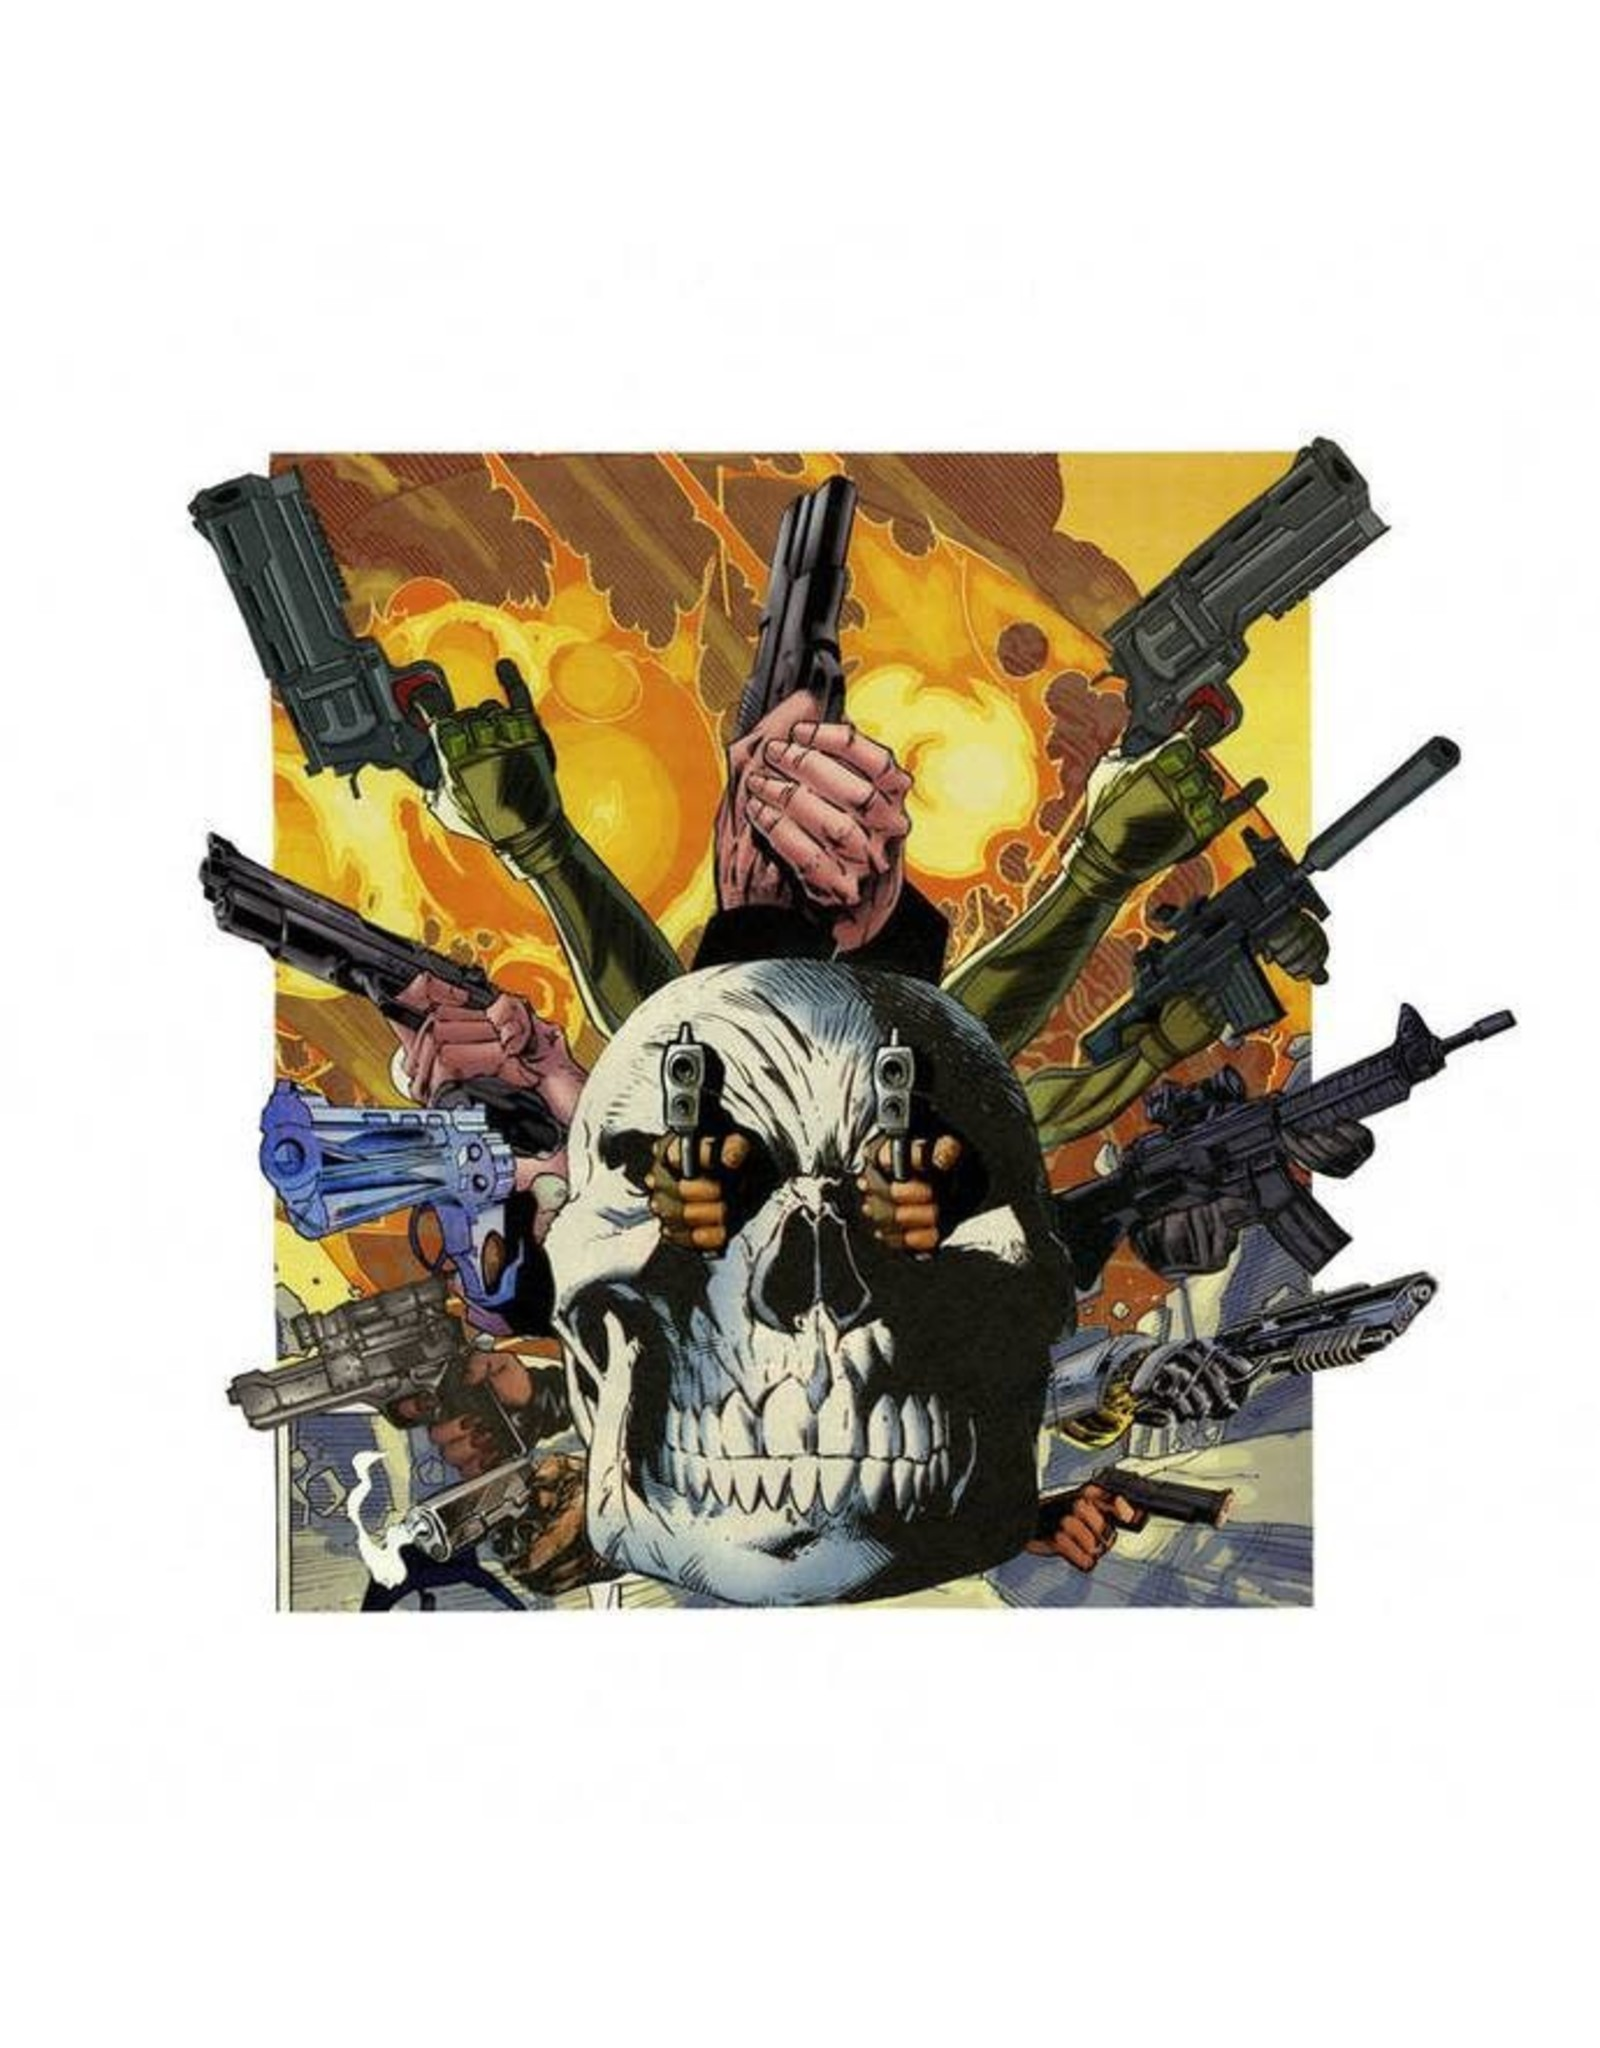 38 Spesh - 6 Shots: Overkill LP